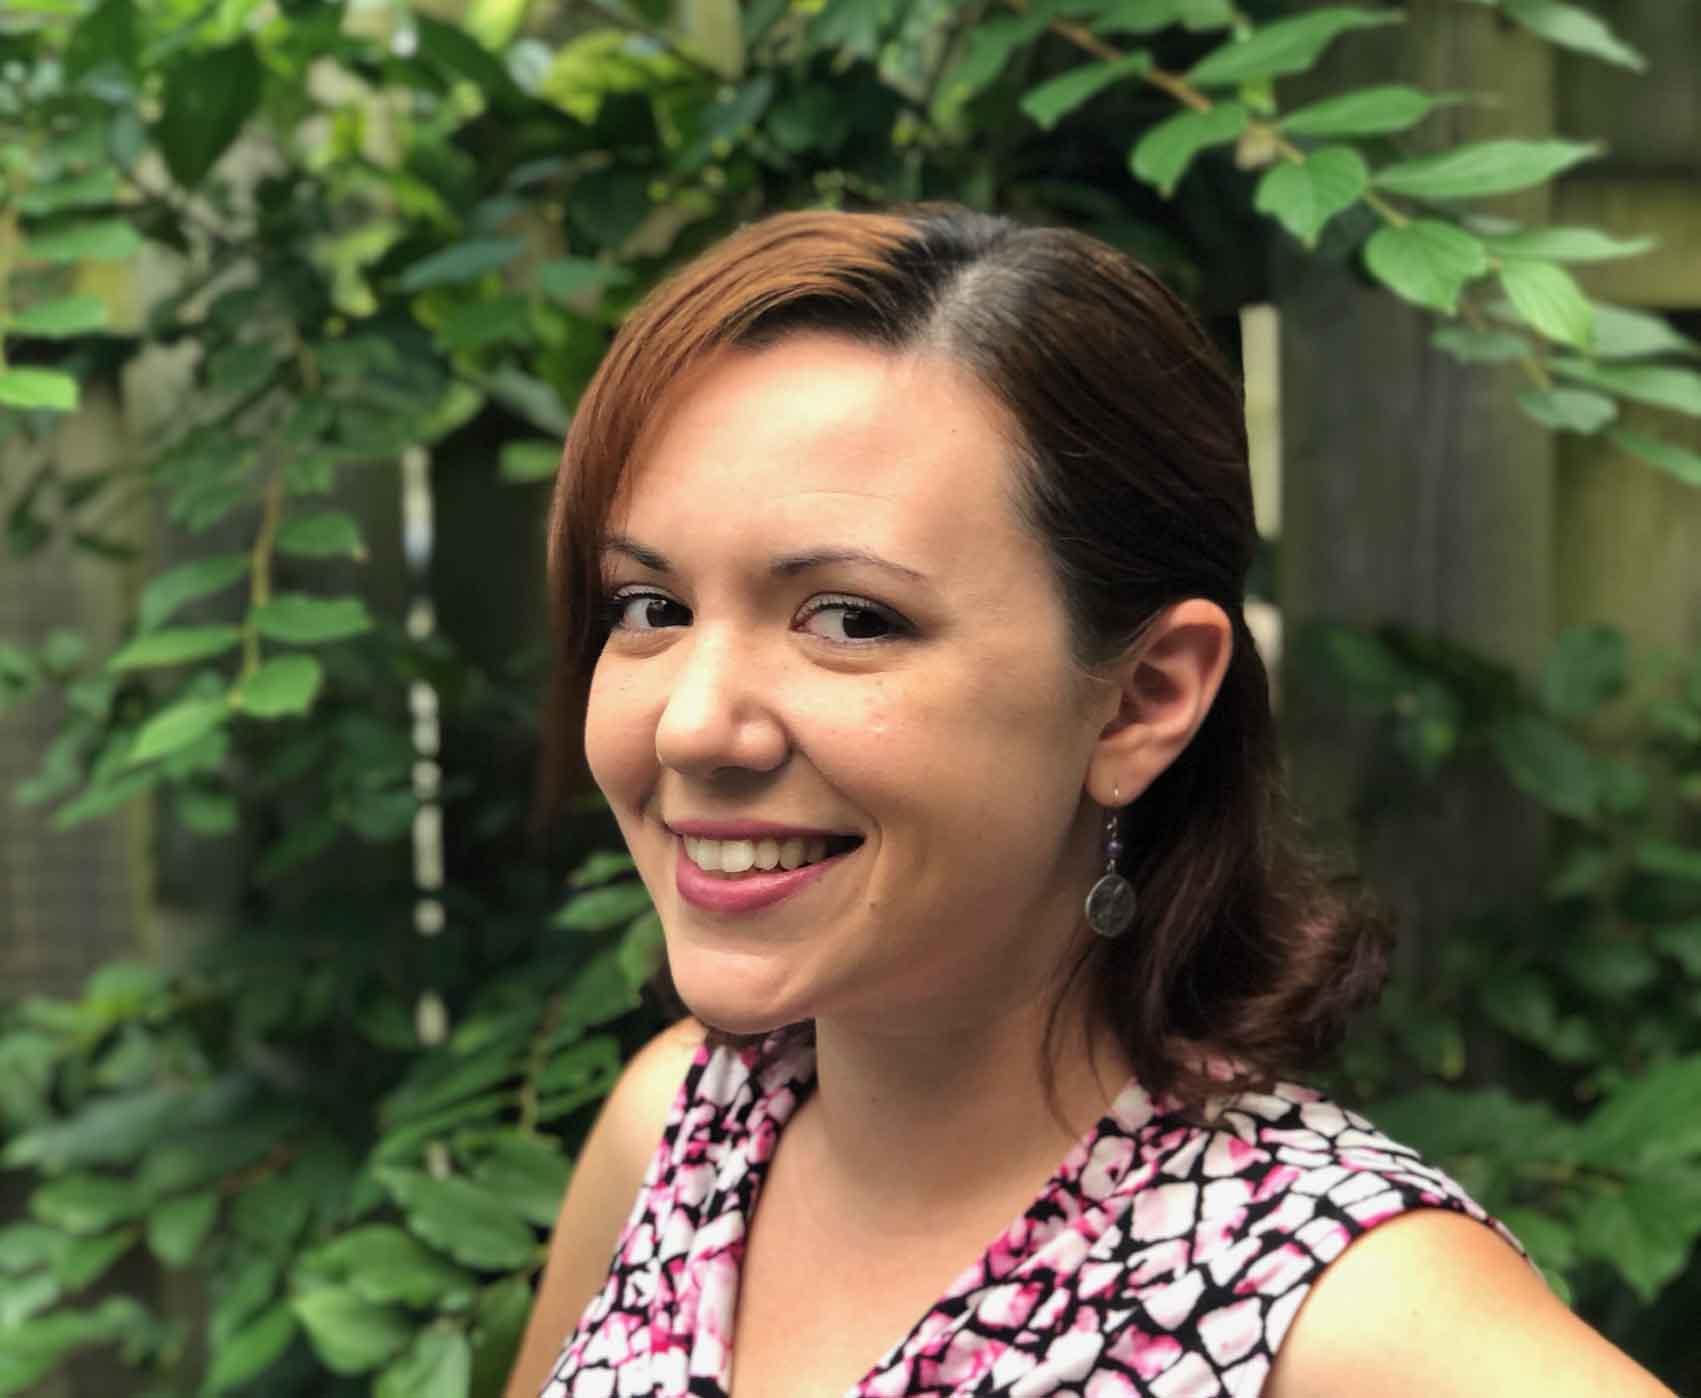 Angela Zender